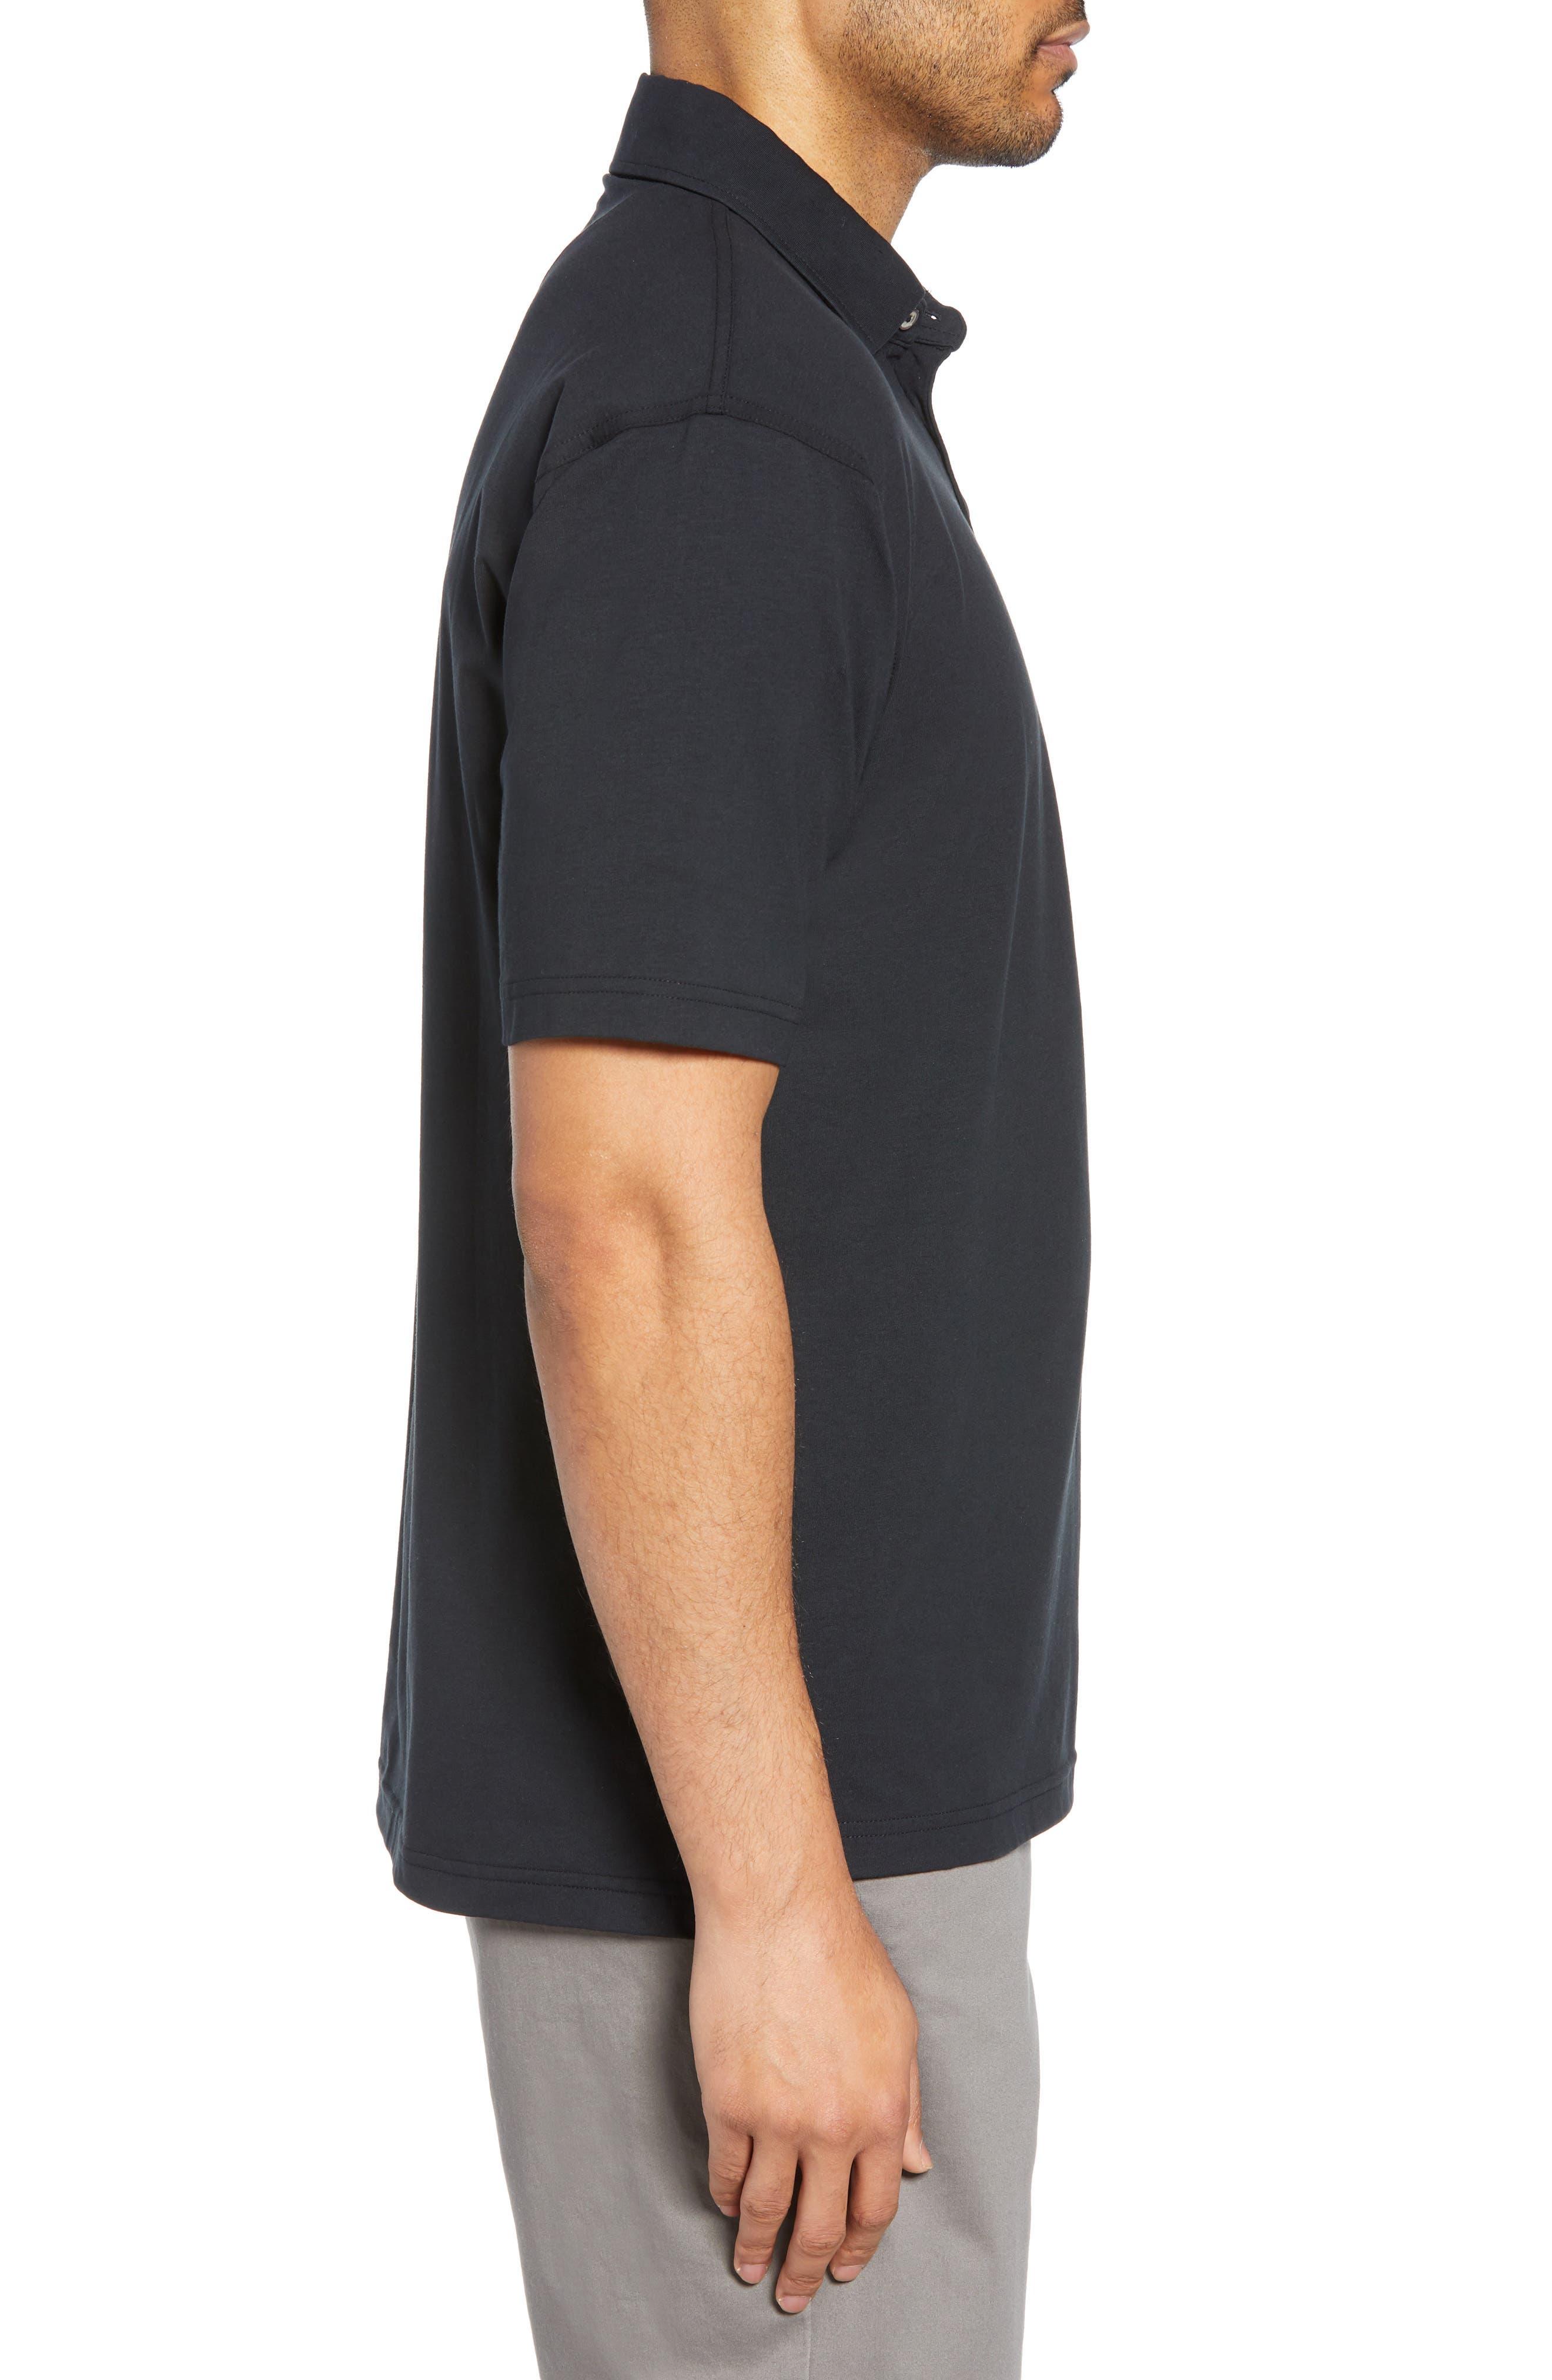 BOBBY JONES,                             Liquid Cotton Stretch Jersey Polo,                             Alternate thumbnail 3, color,                             BLACK